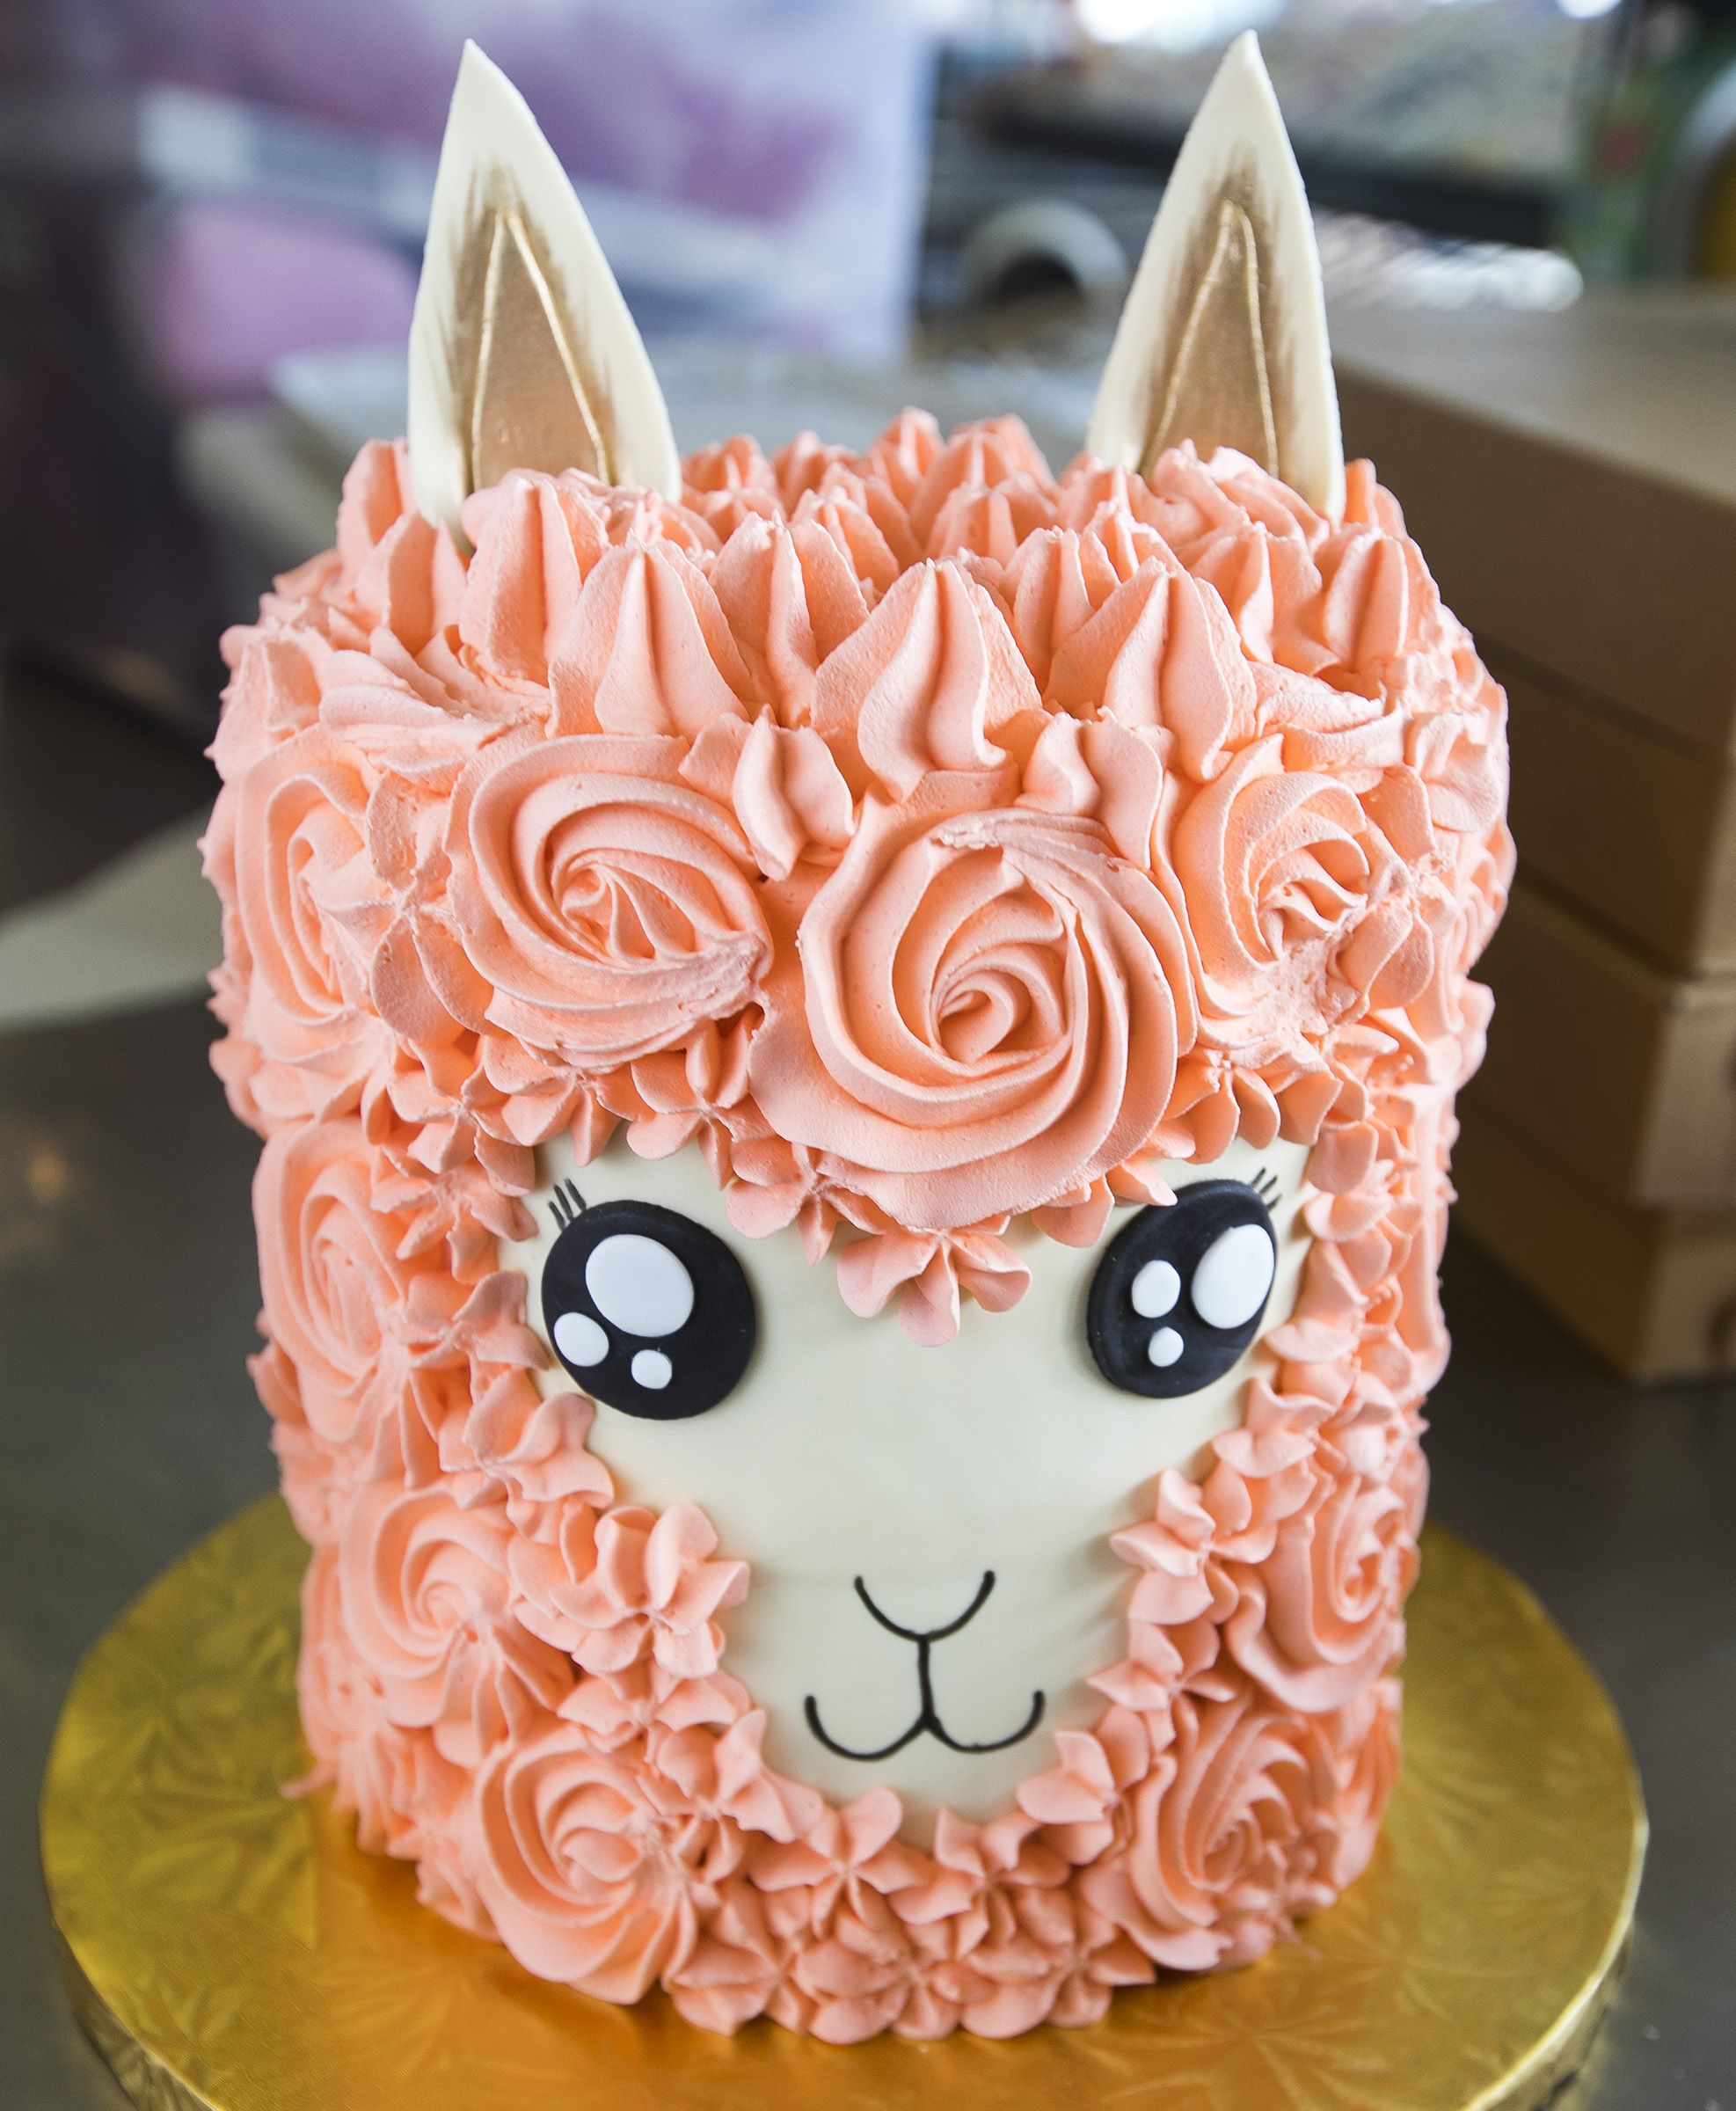 Llama Cake 217 Kids Birthday Cakes Pinterest Cake Cupcake